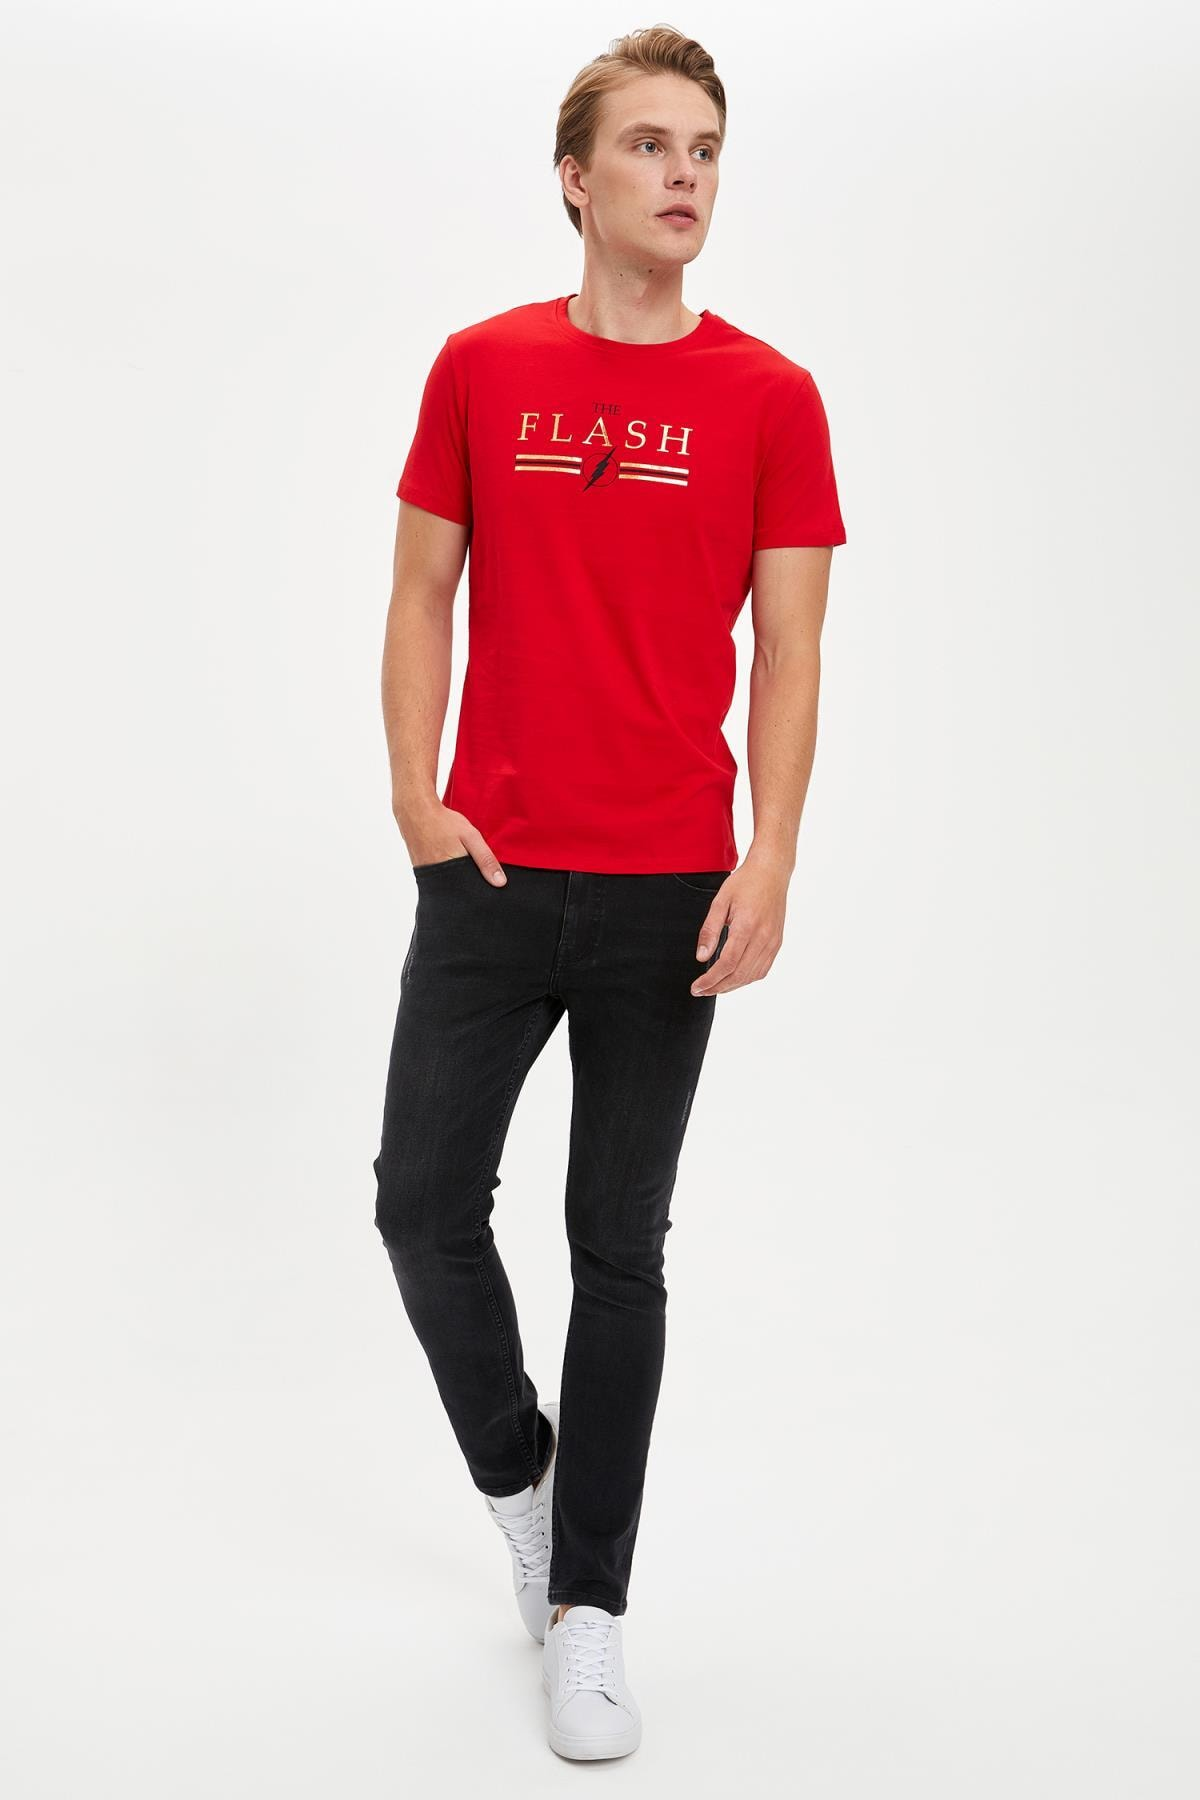 Defacto Erkek Kırmızı Warner Bros Flash Lisanslı Slim Fit Bisiklet Yaka Tişört 1